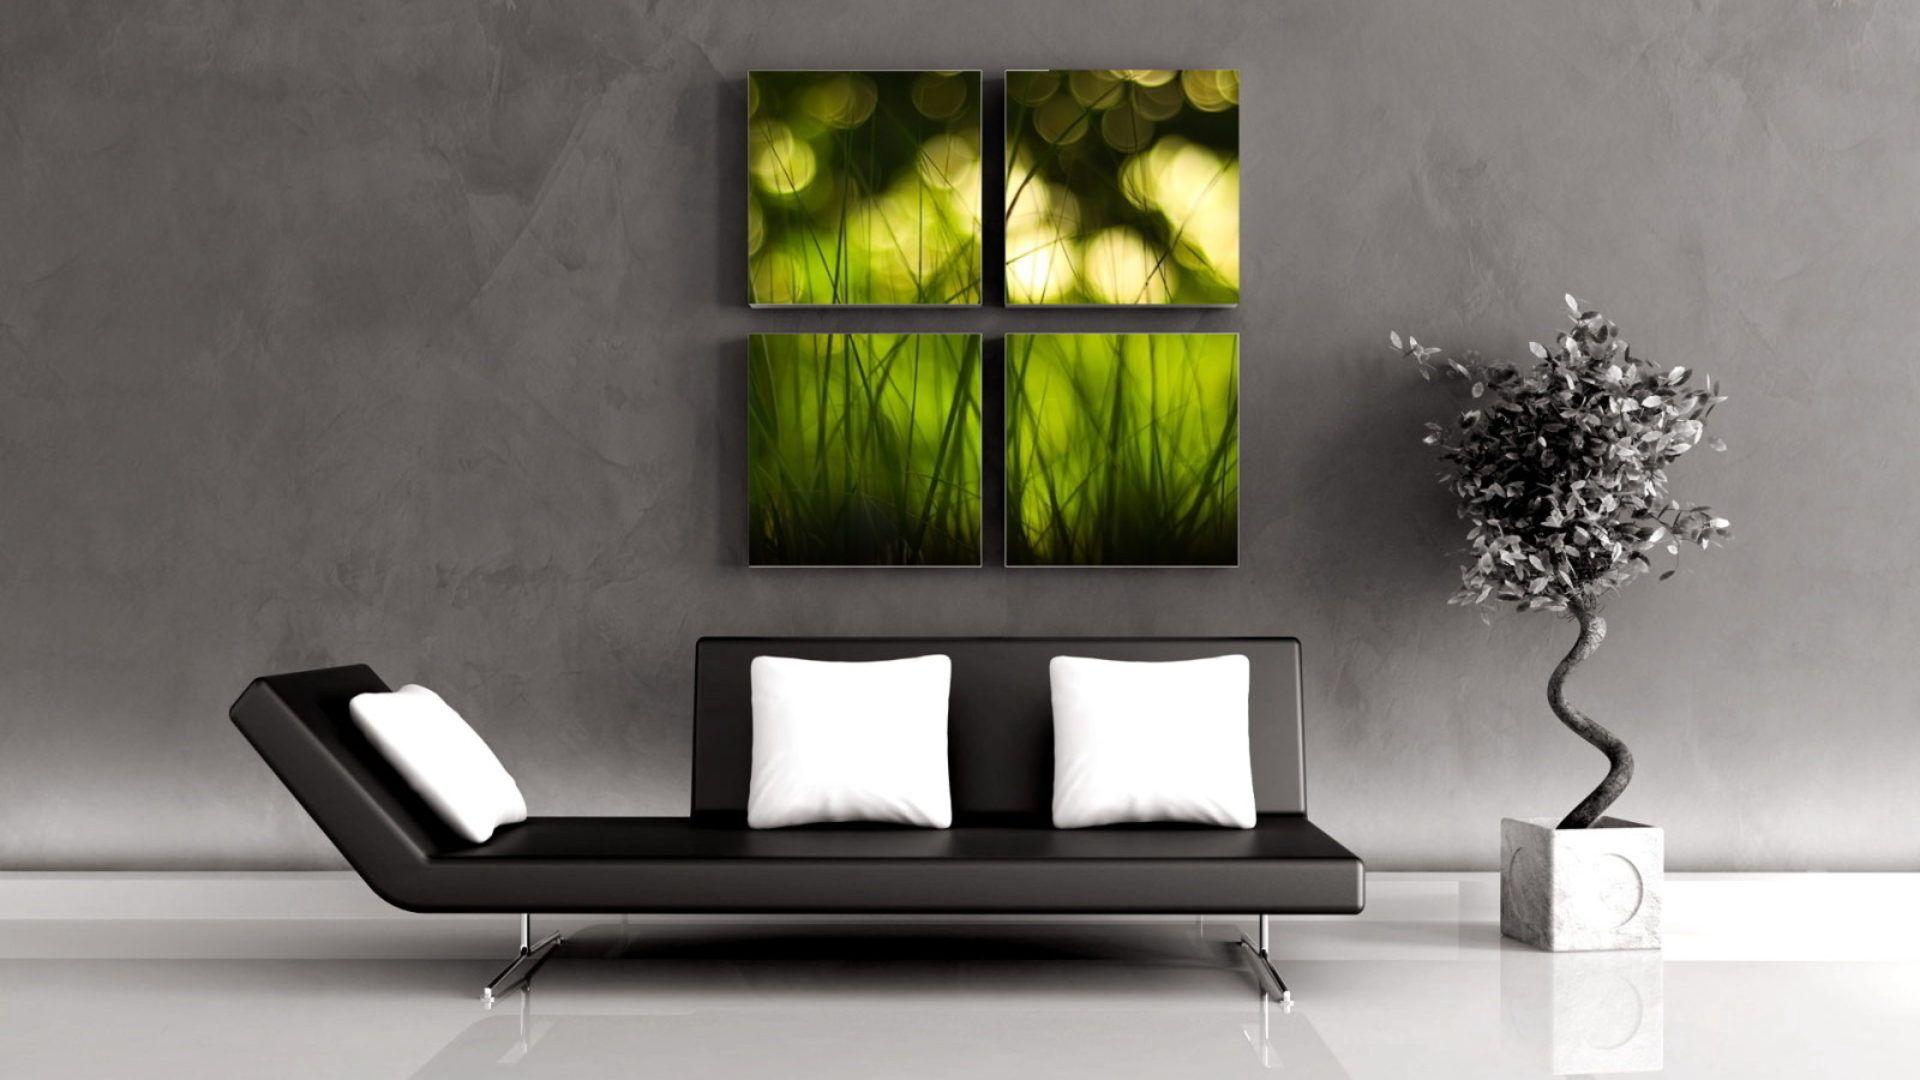 Furniture Background